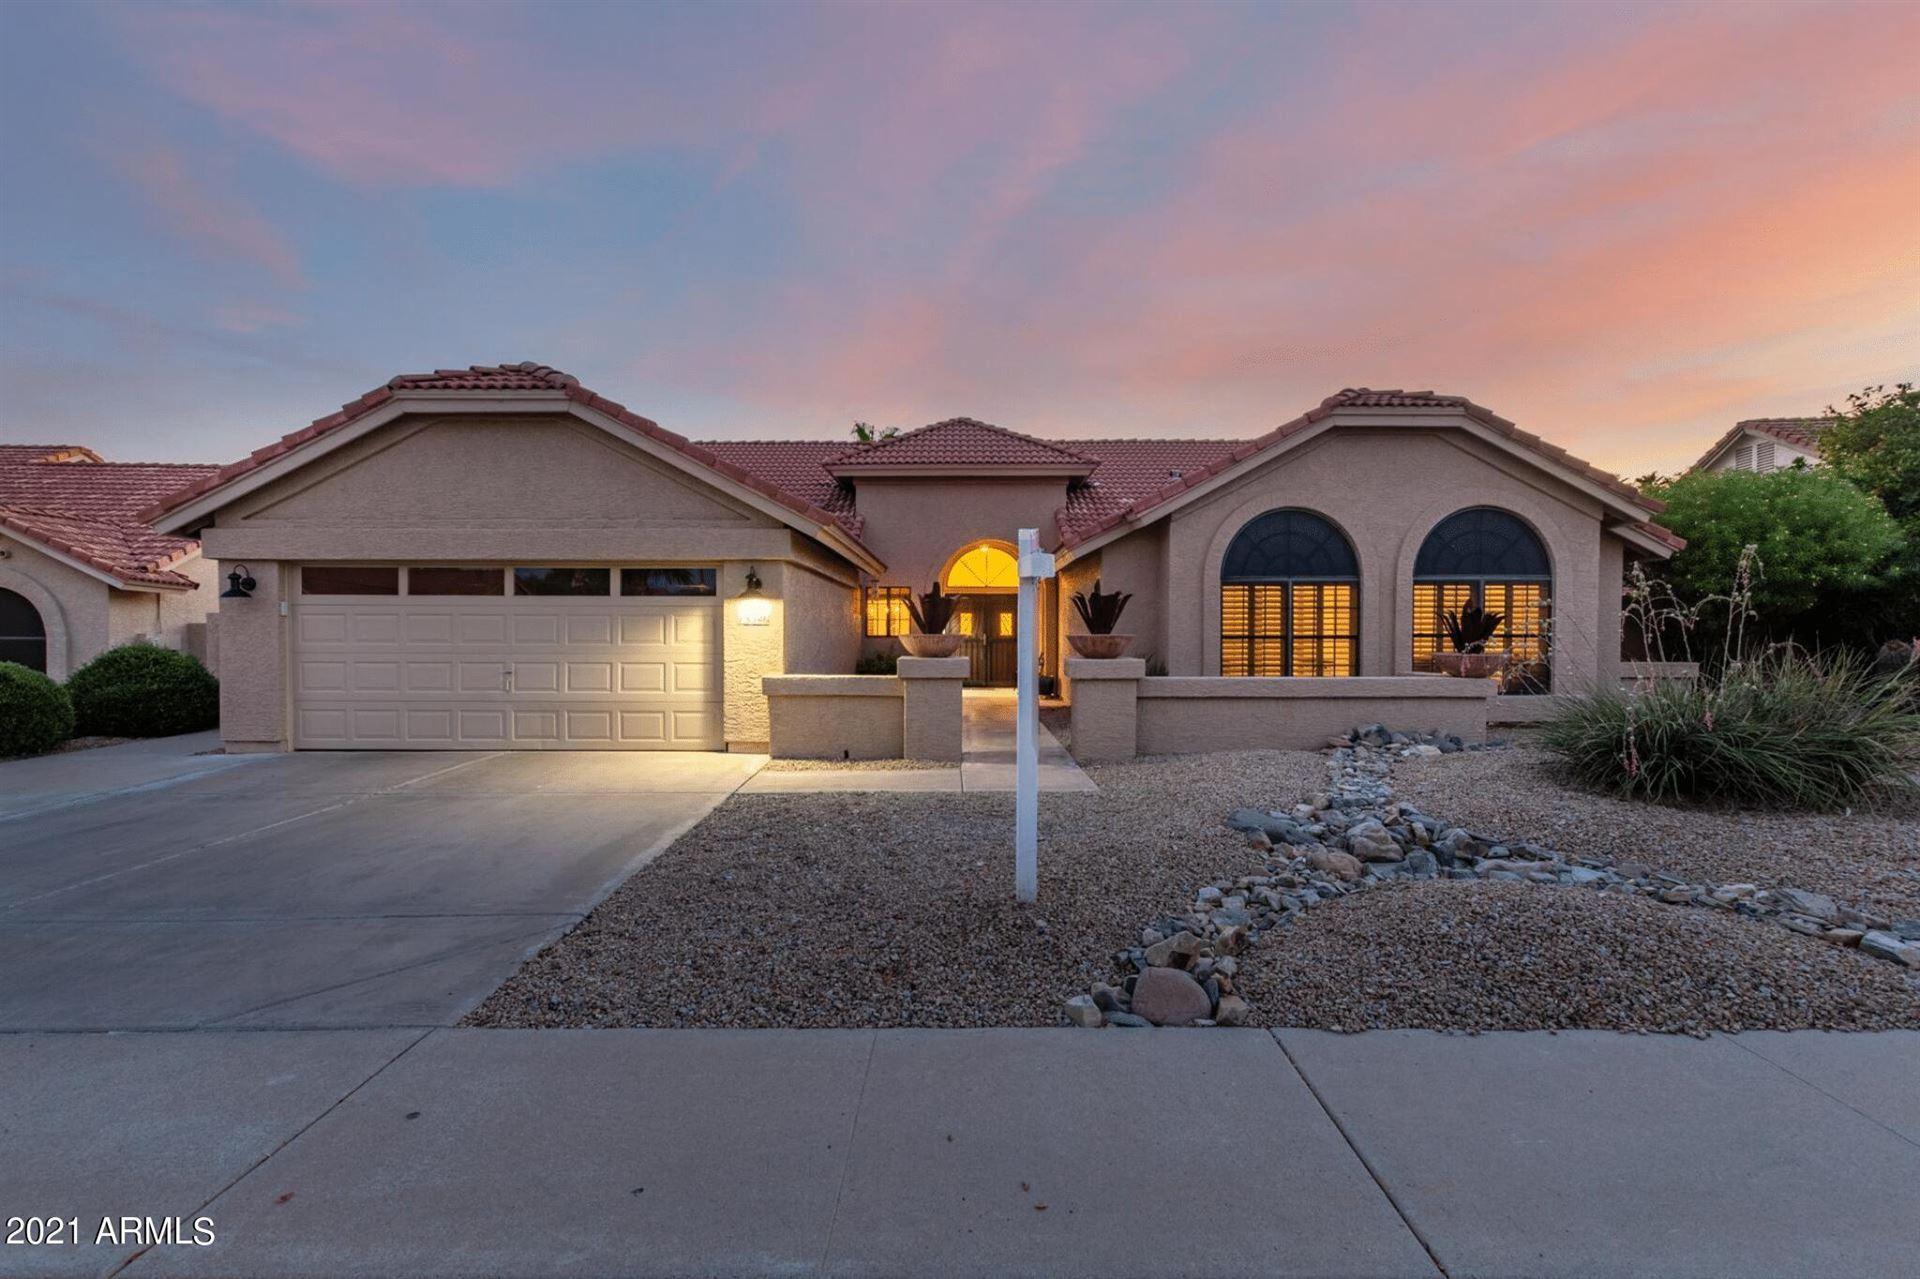 Photo of 13346 N 101ST Street, Scottsdale, AZ 85260 (MLS # 6249611)